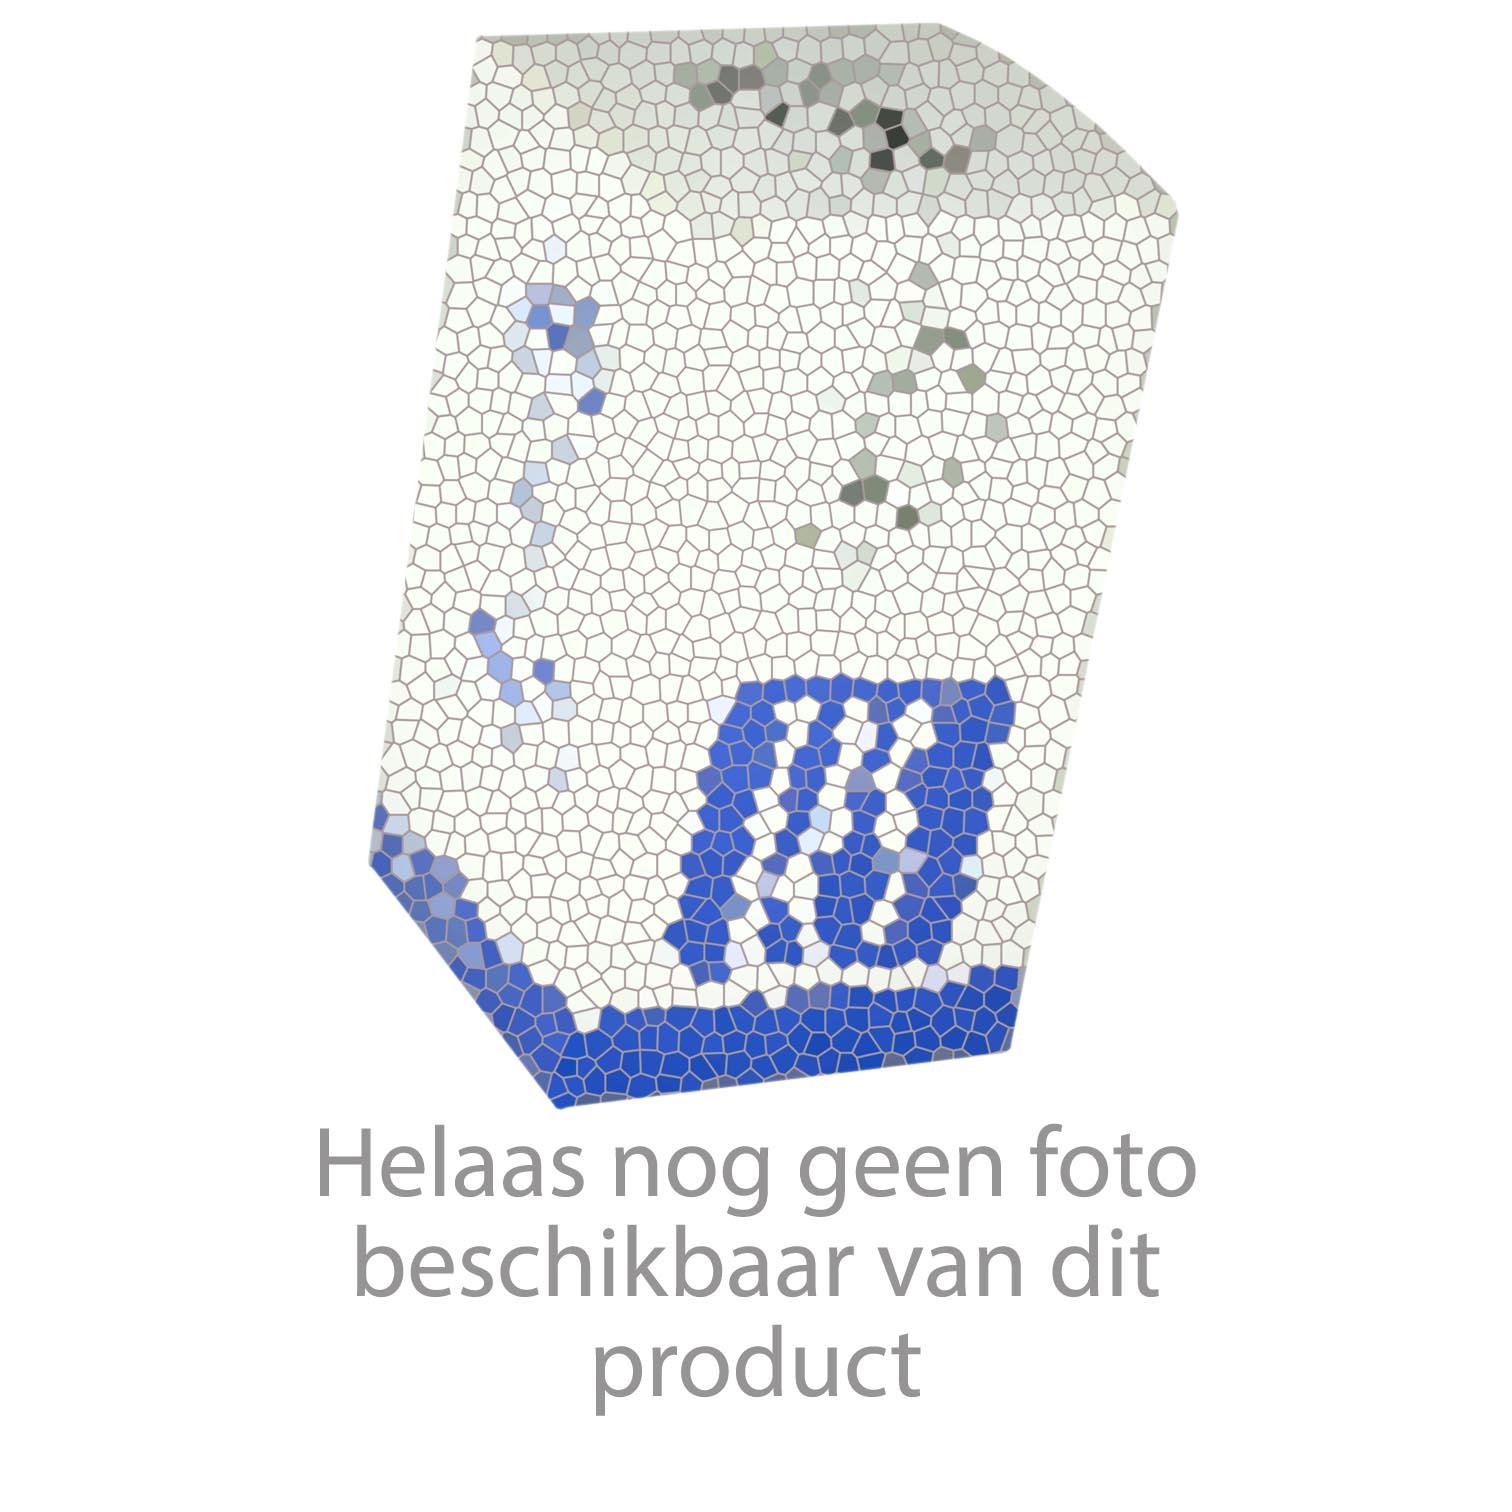 Grohe onderdelen Concetto 2-Gats Wastafelmengkraan Wand 19575001